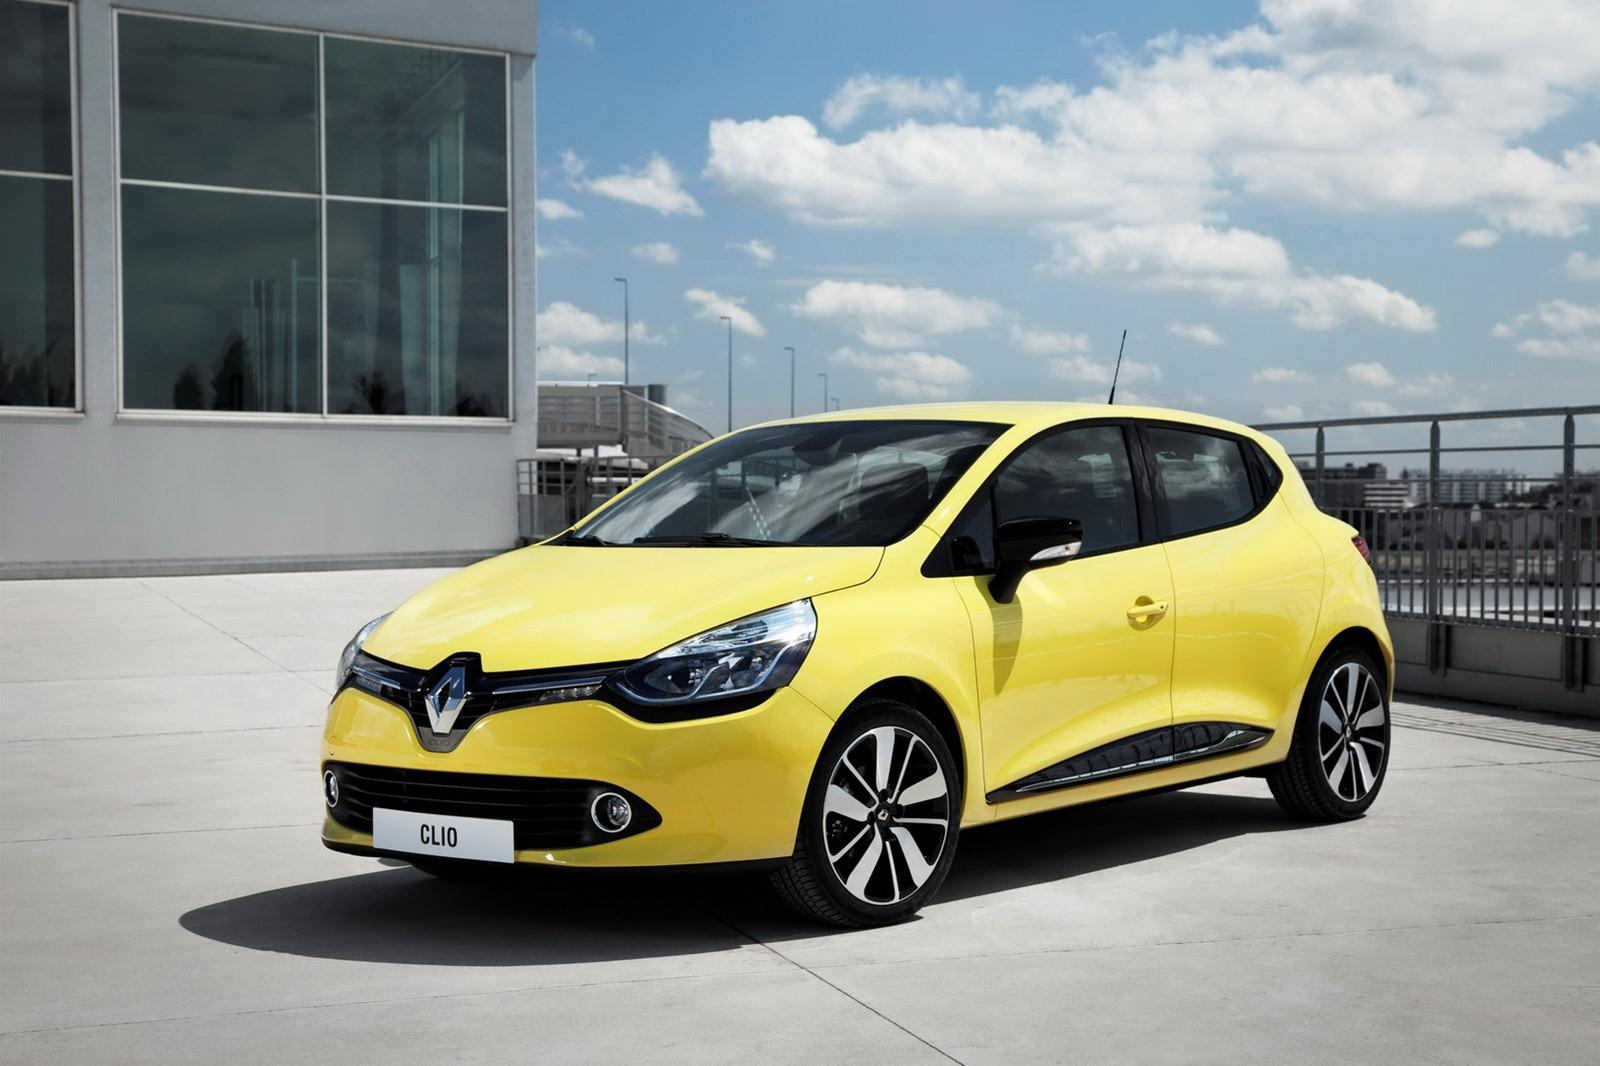 2013-Renault-Clio-Mk4-34%25255B2%25255D.jpg